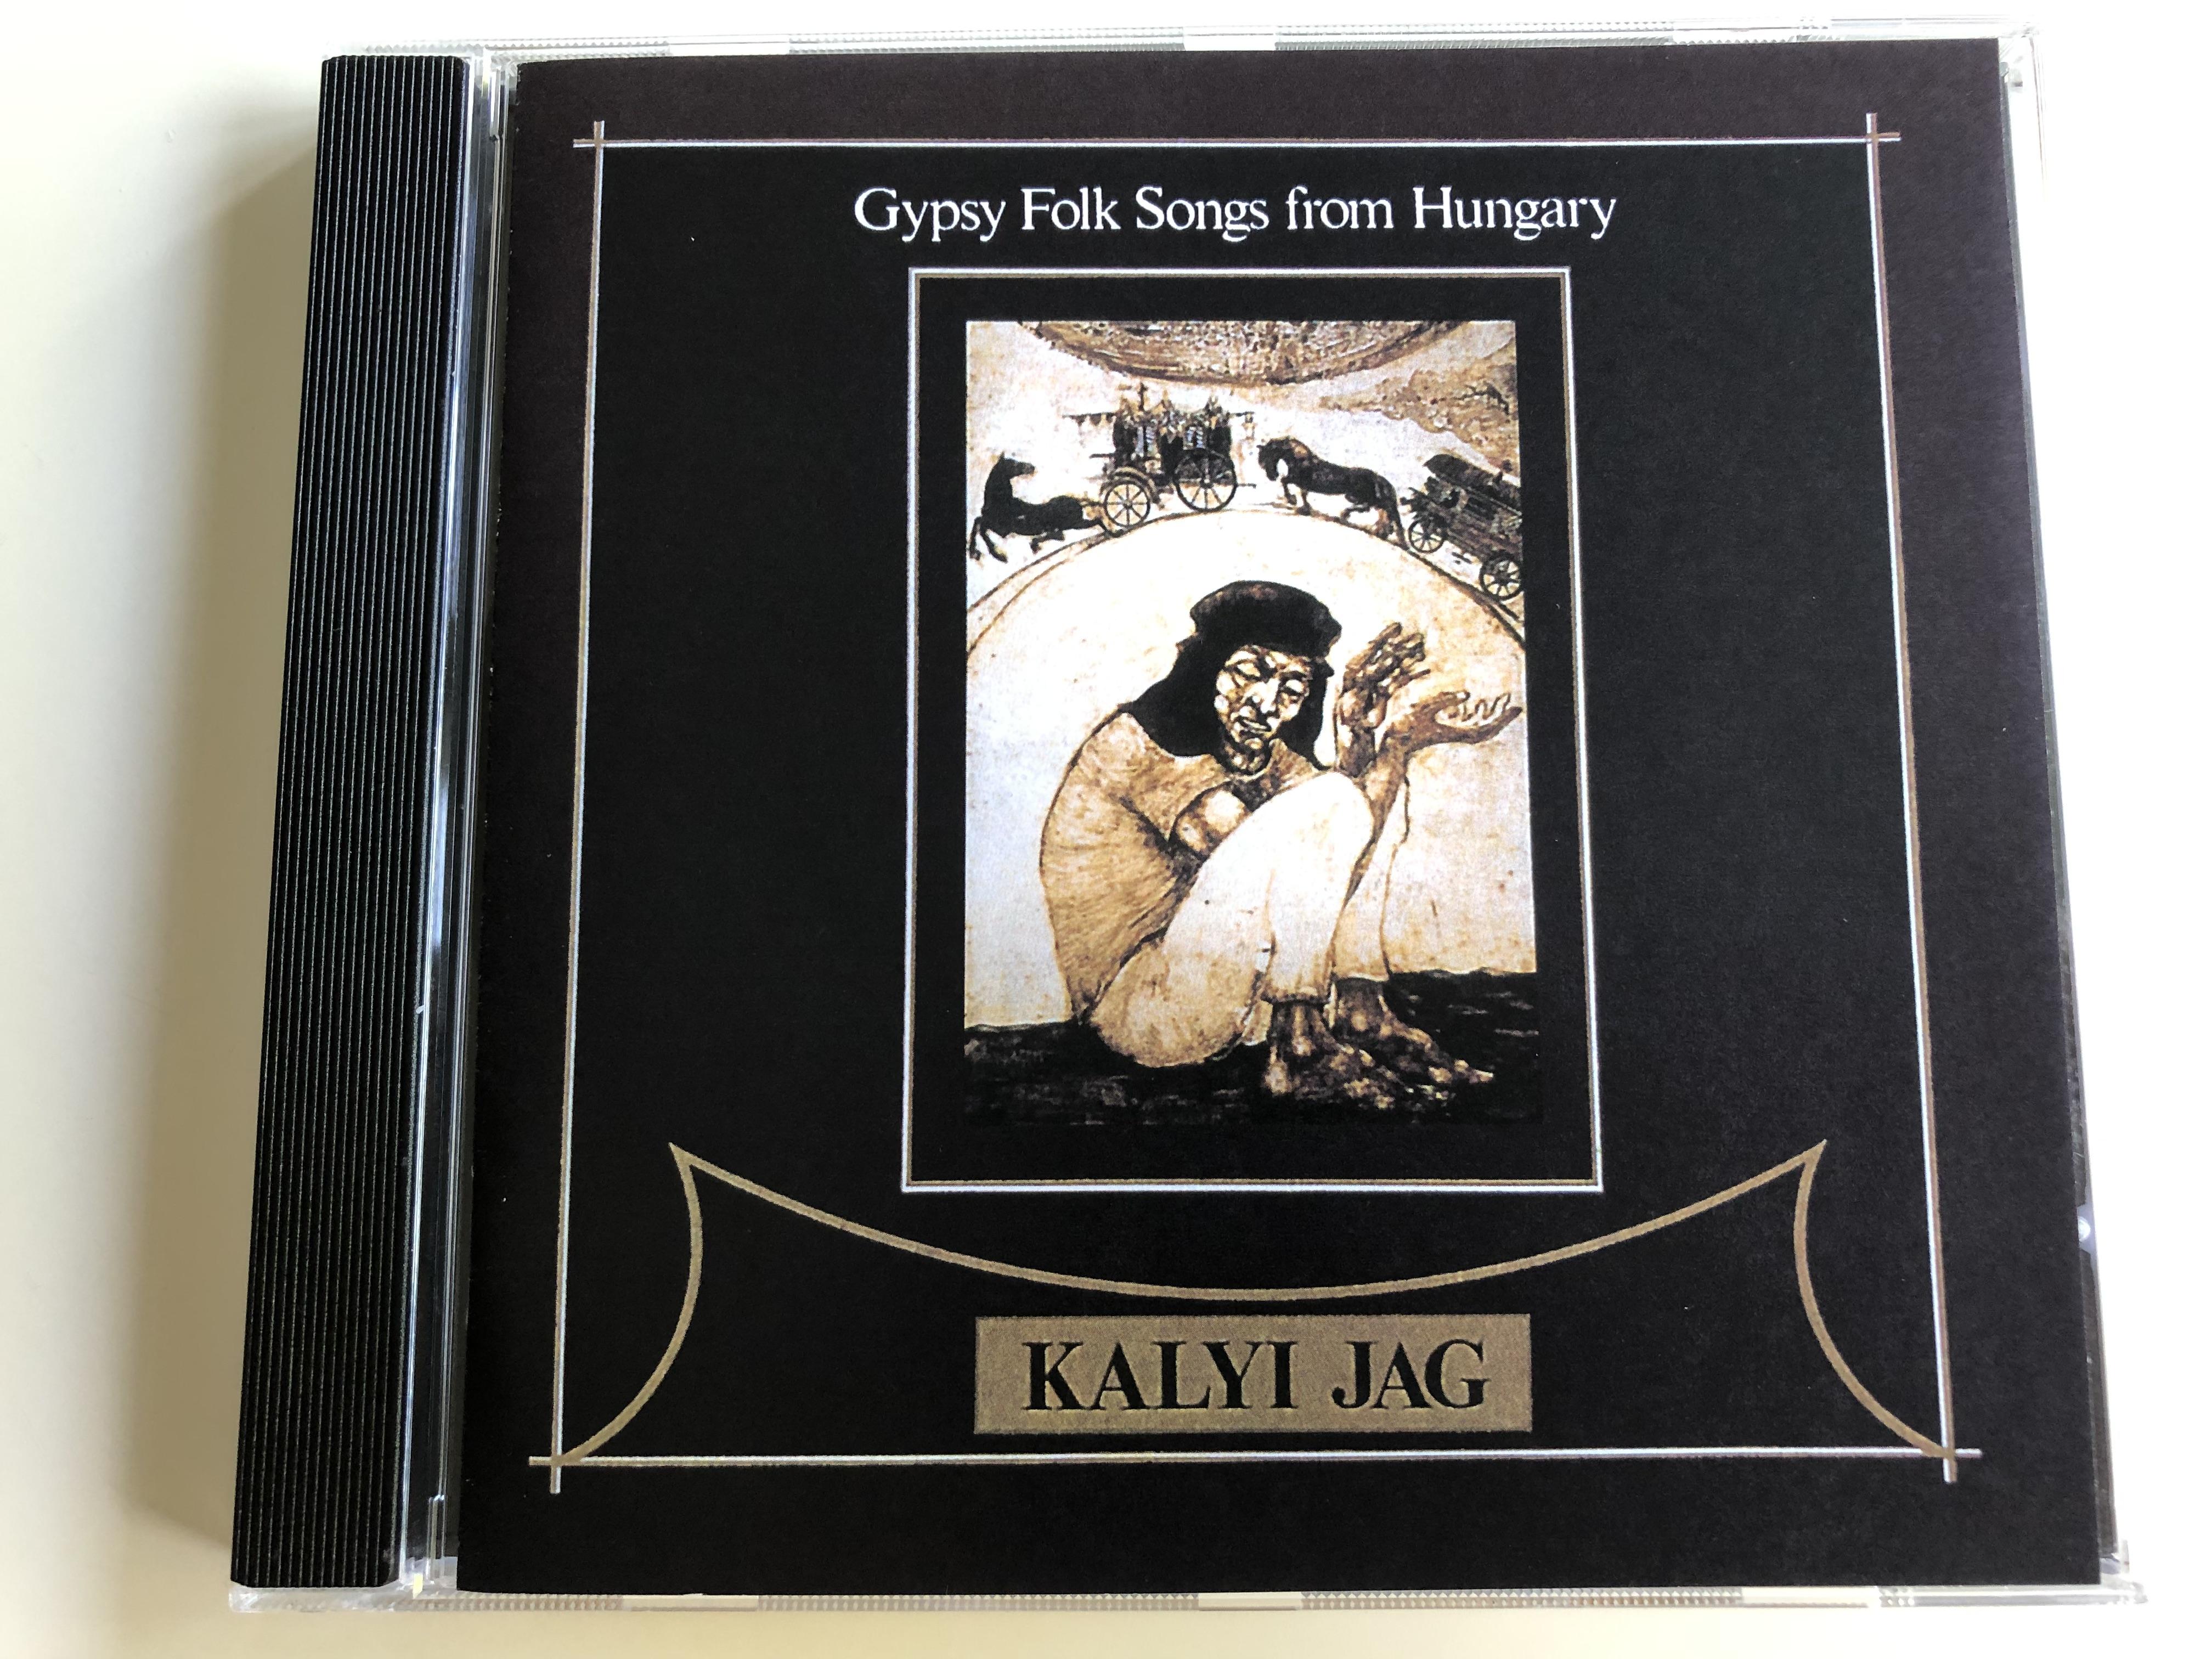 kalyi-jag-gypsy-folk-songs-from-hungary-audio-cd-2016-hungaroton-hcd-18132-1-.jpg